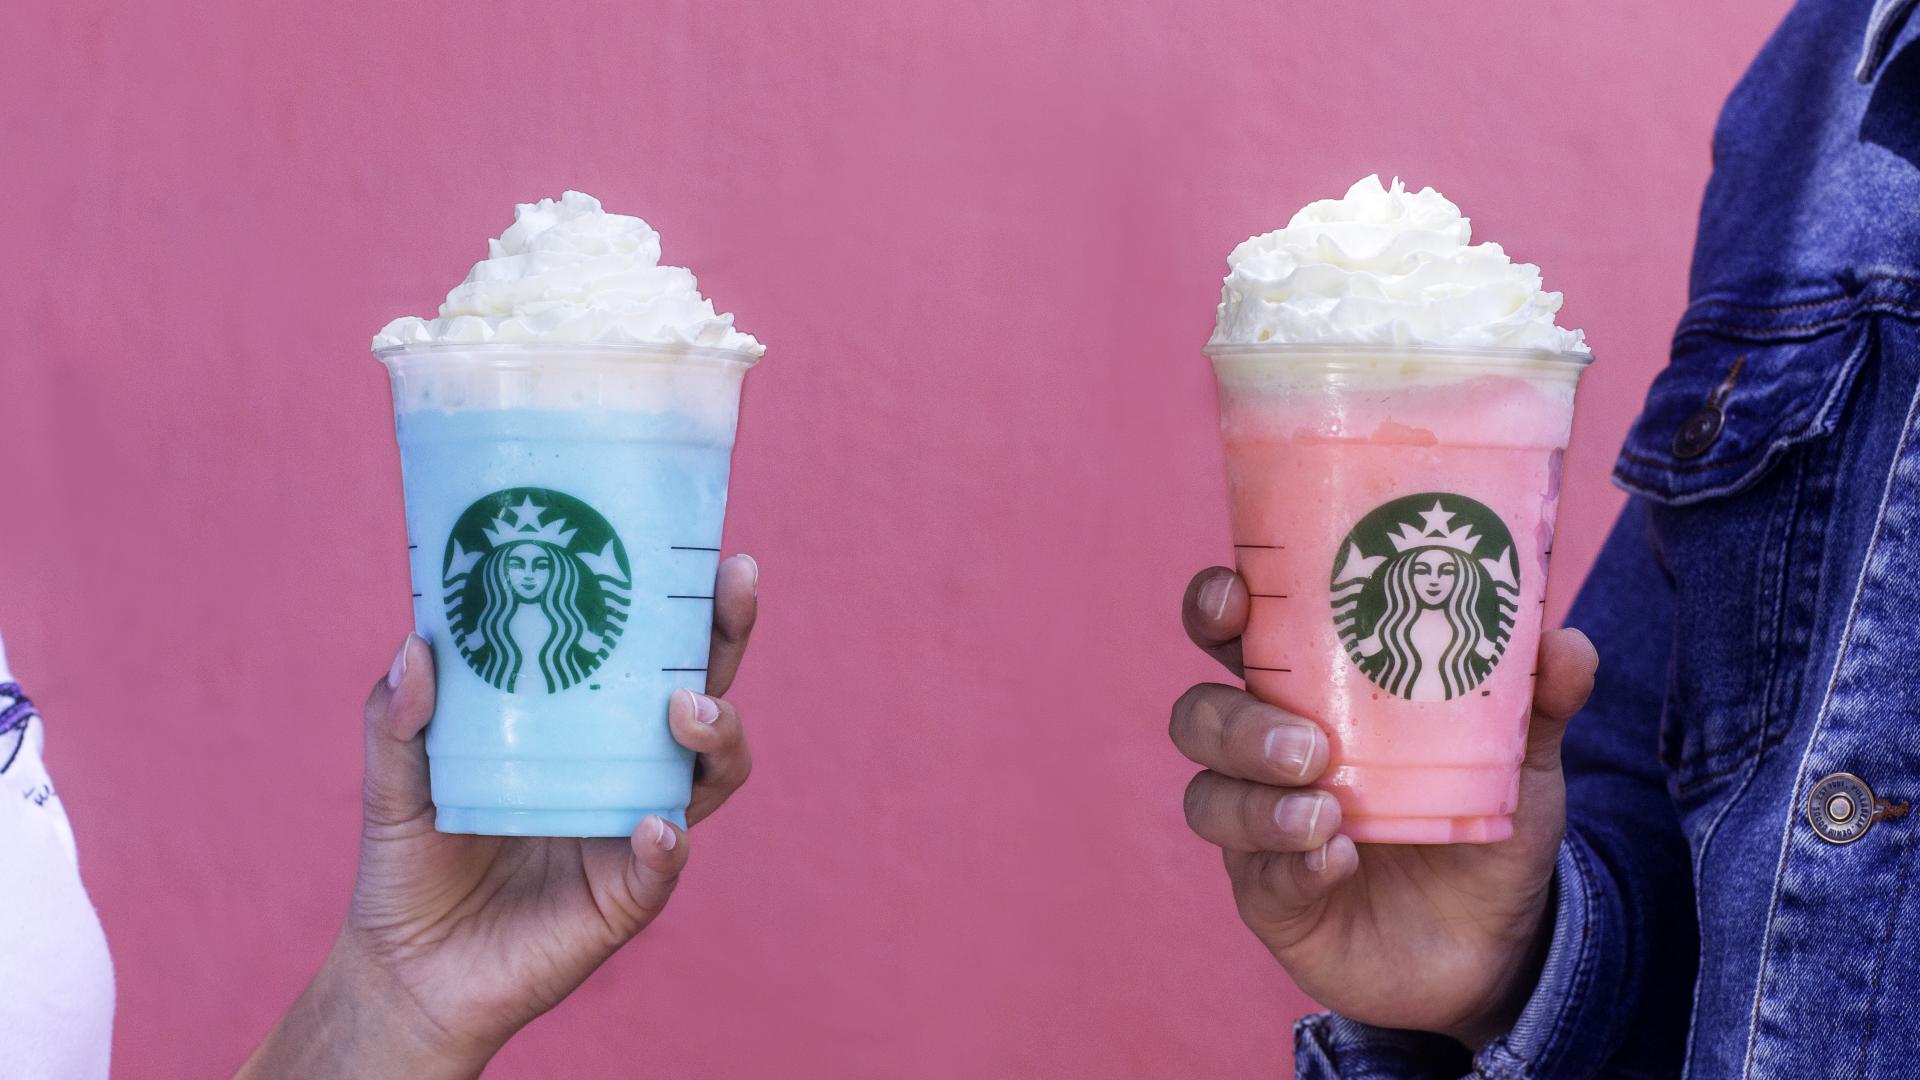 Con este Frappuccino, Starbucks quiere que vuelvas a ser niño